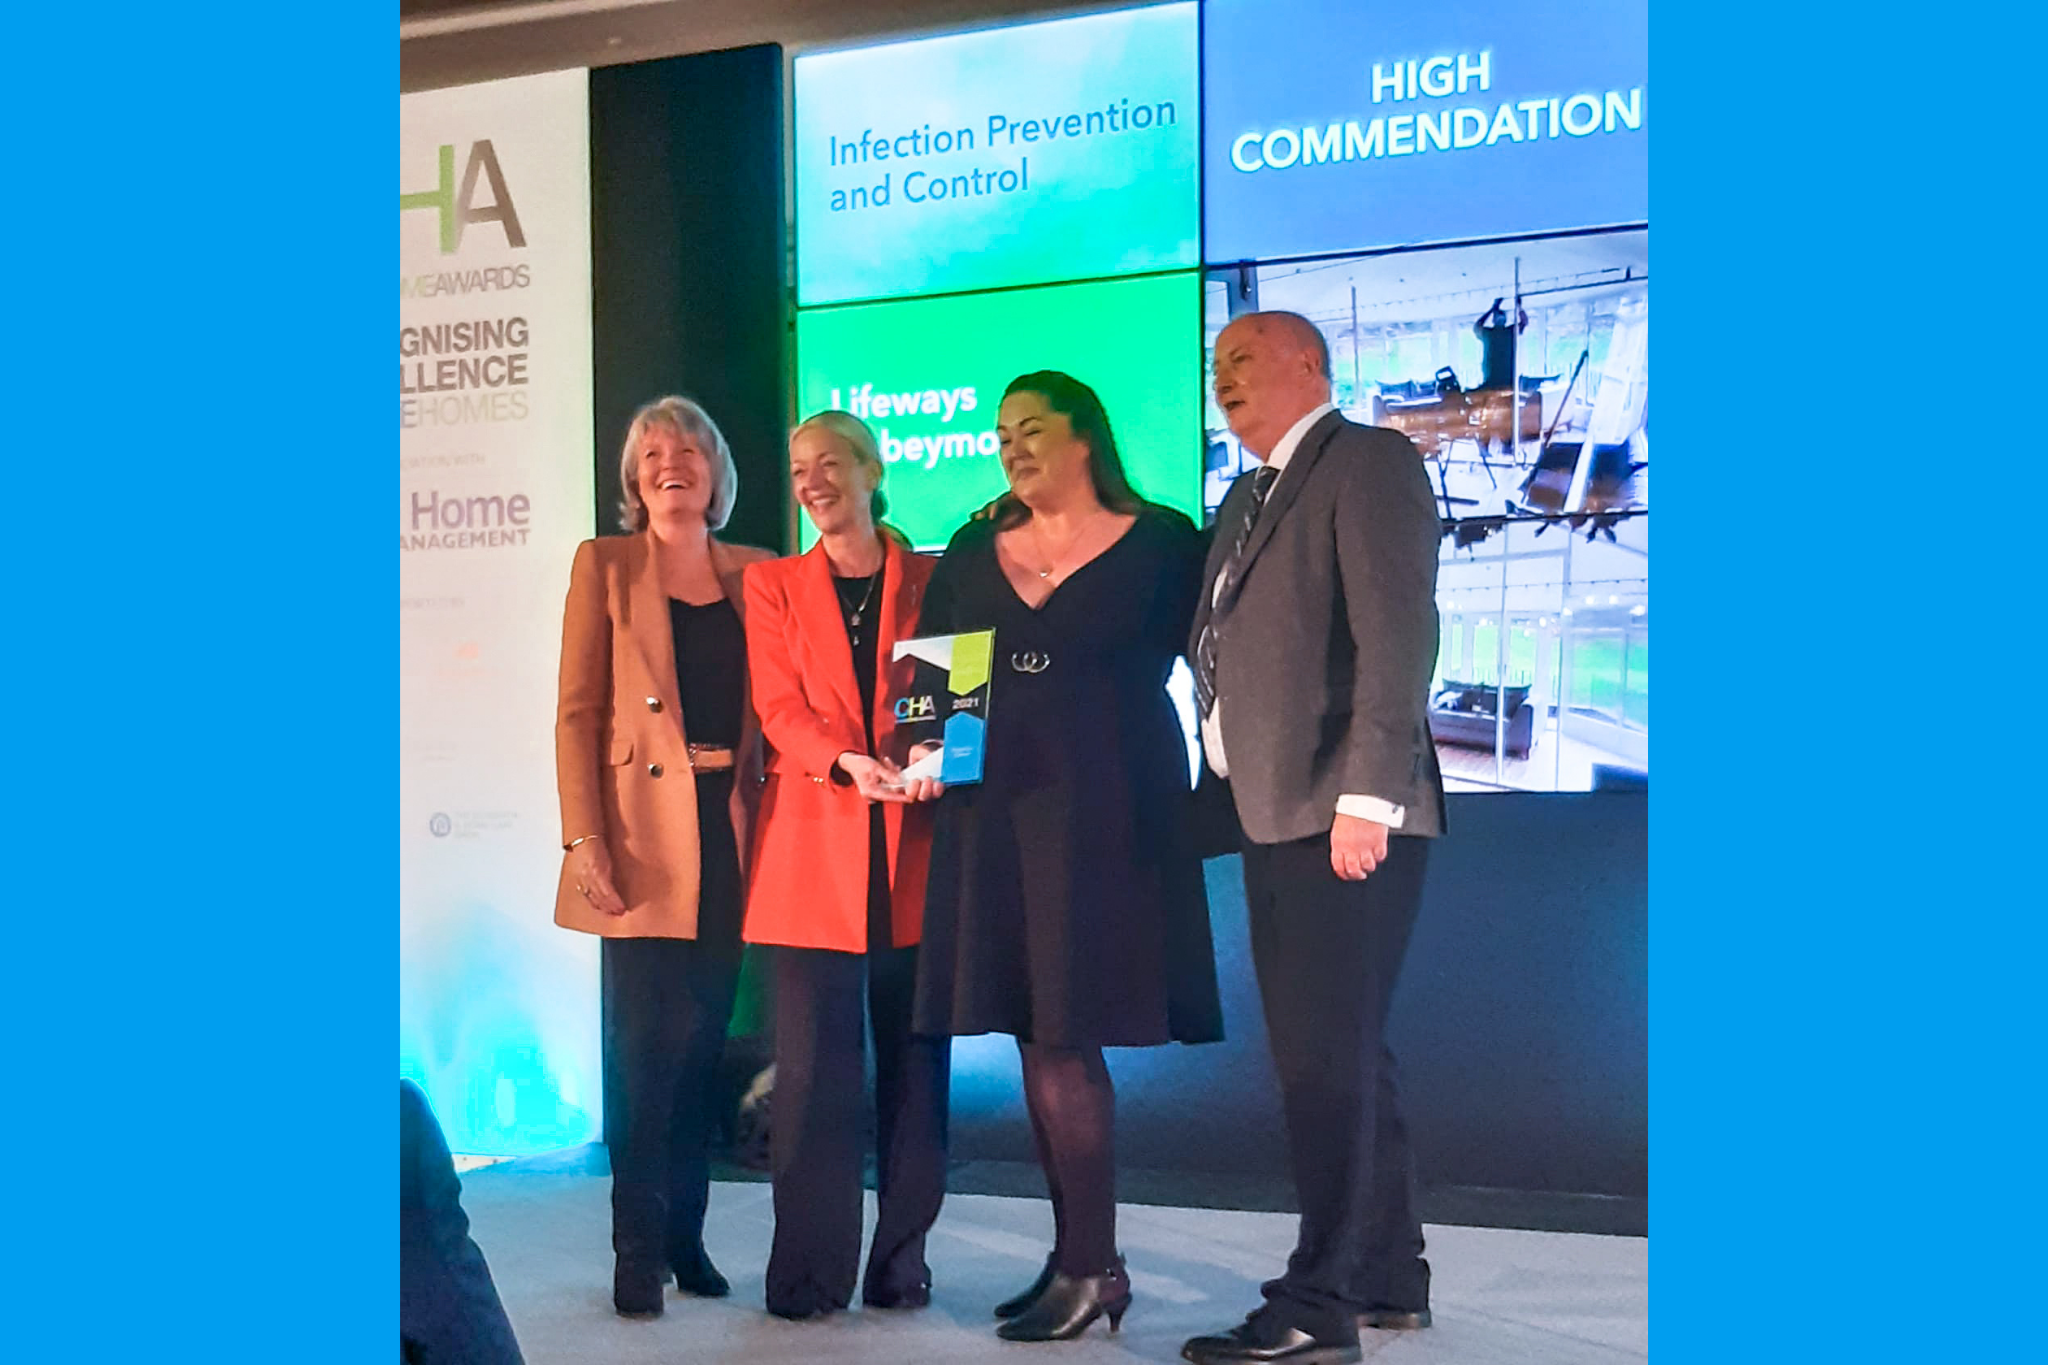 Abbeymoor gateshead care home awards